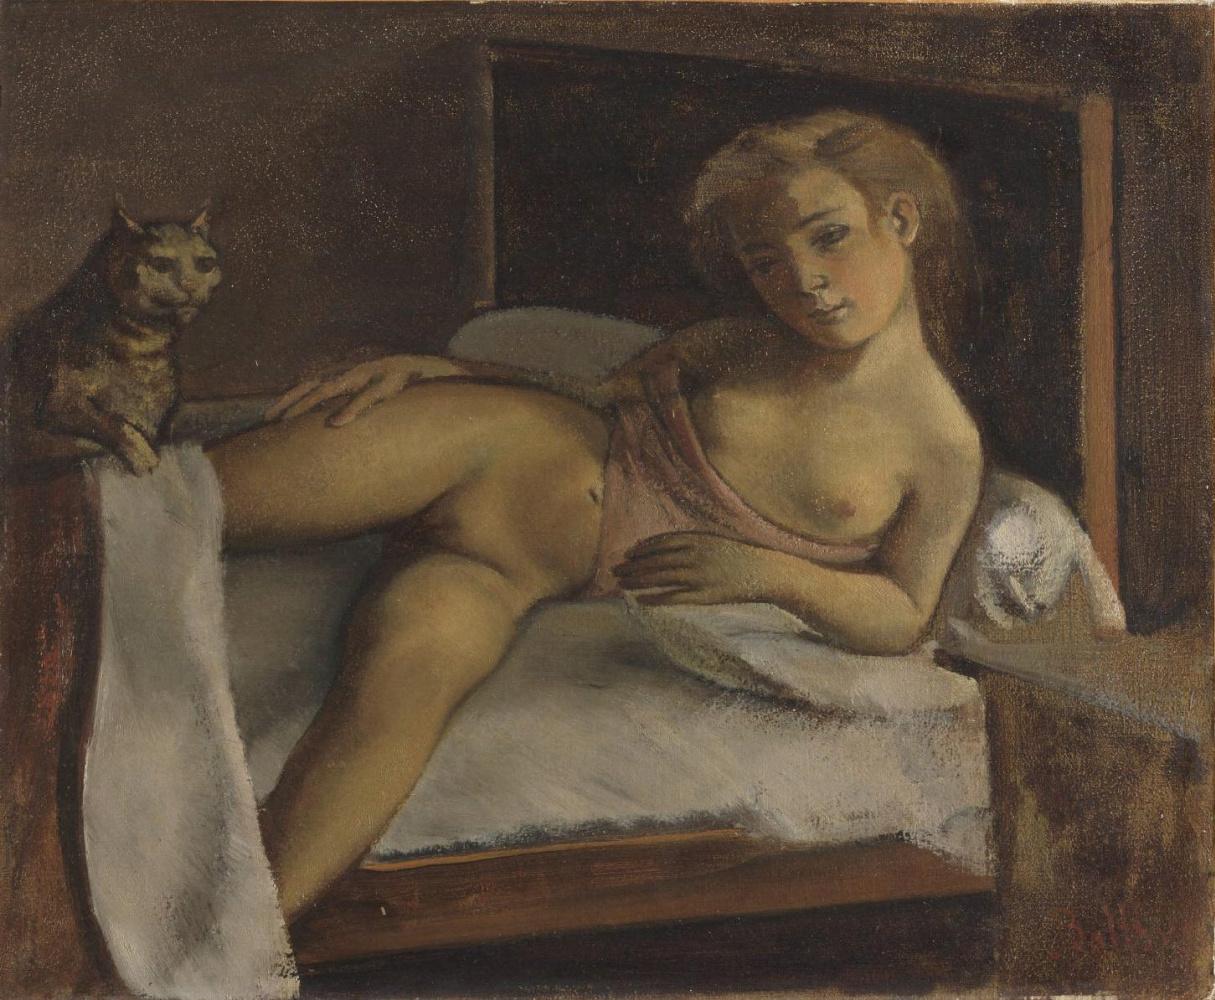 Balthus (Balthasar Klossovsky de Rola). Girl with a cat